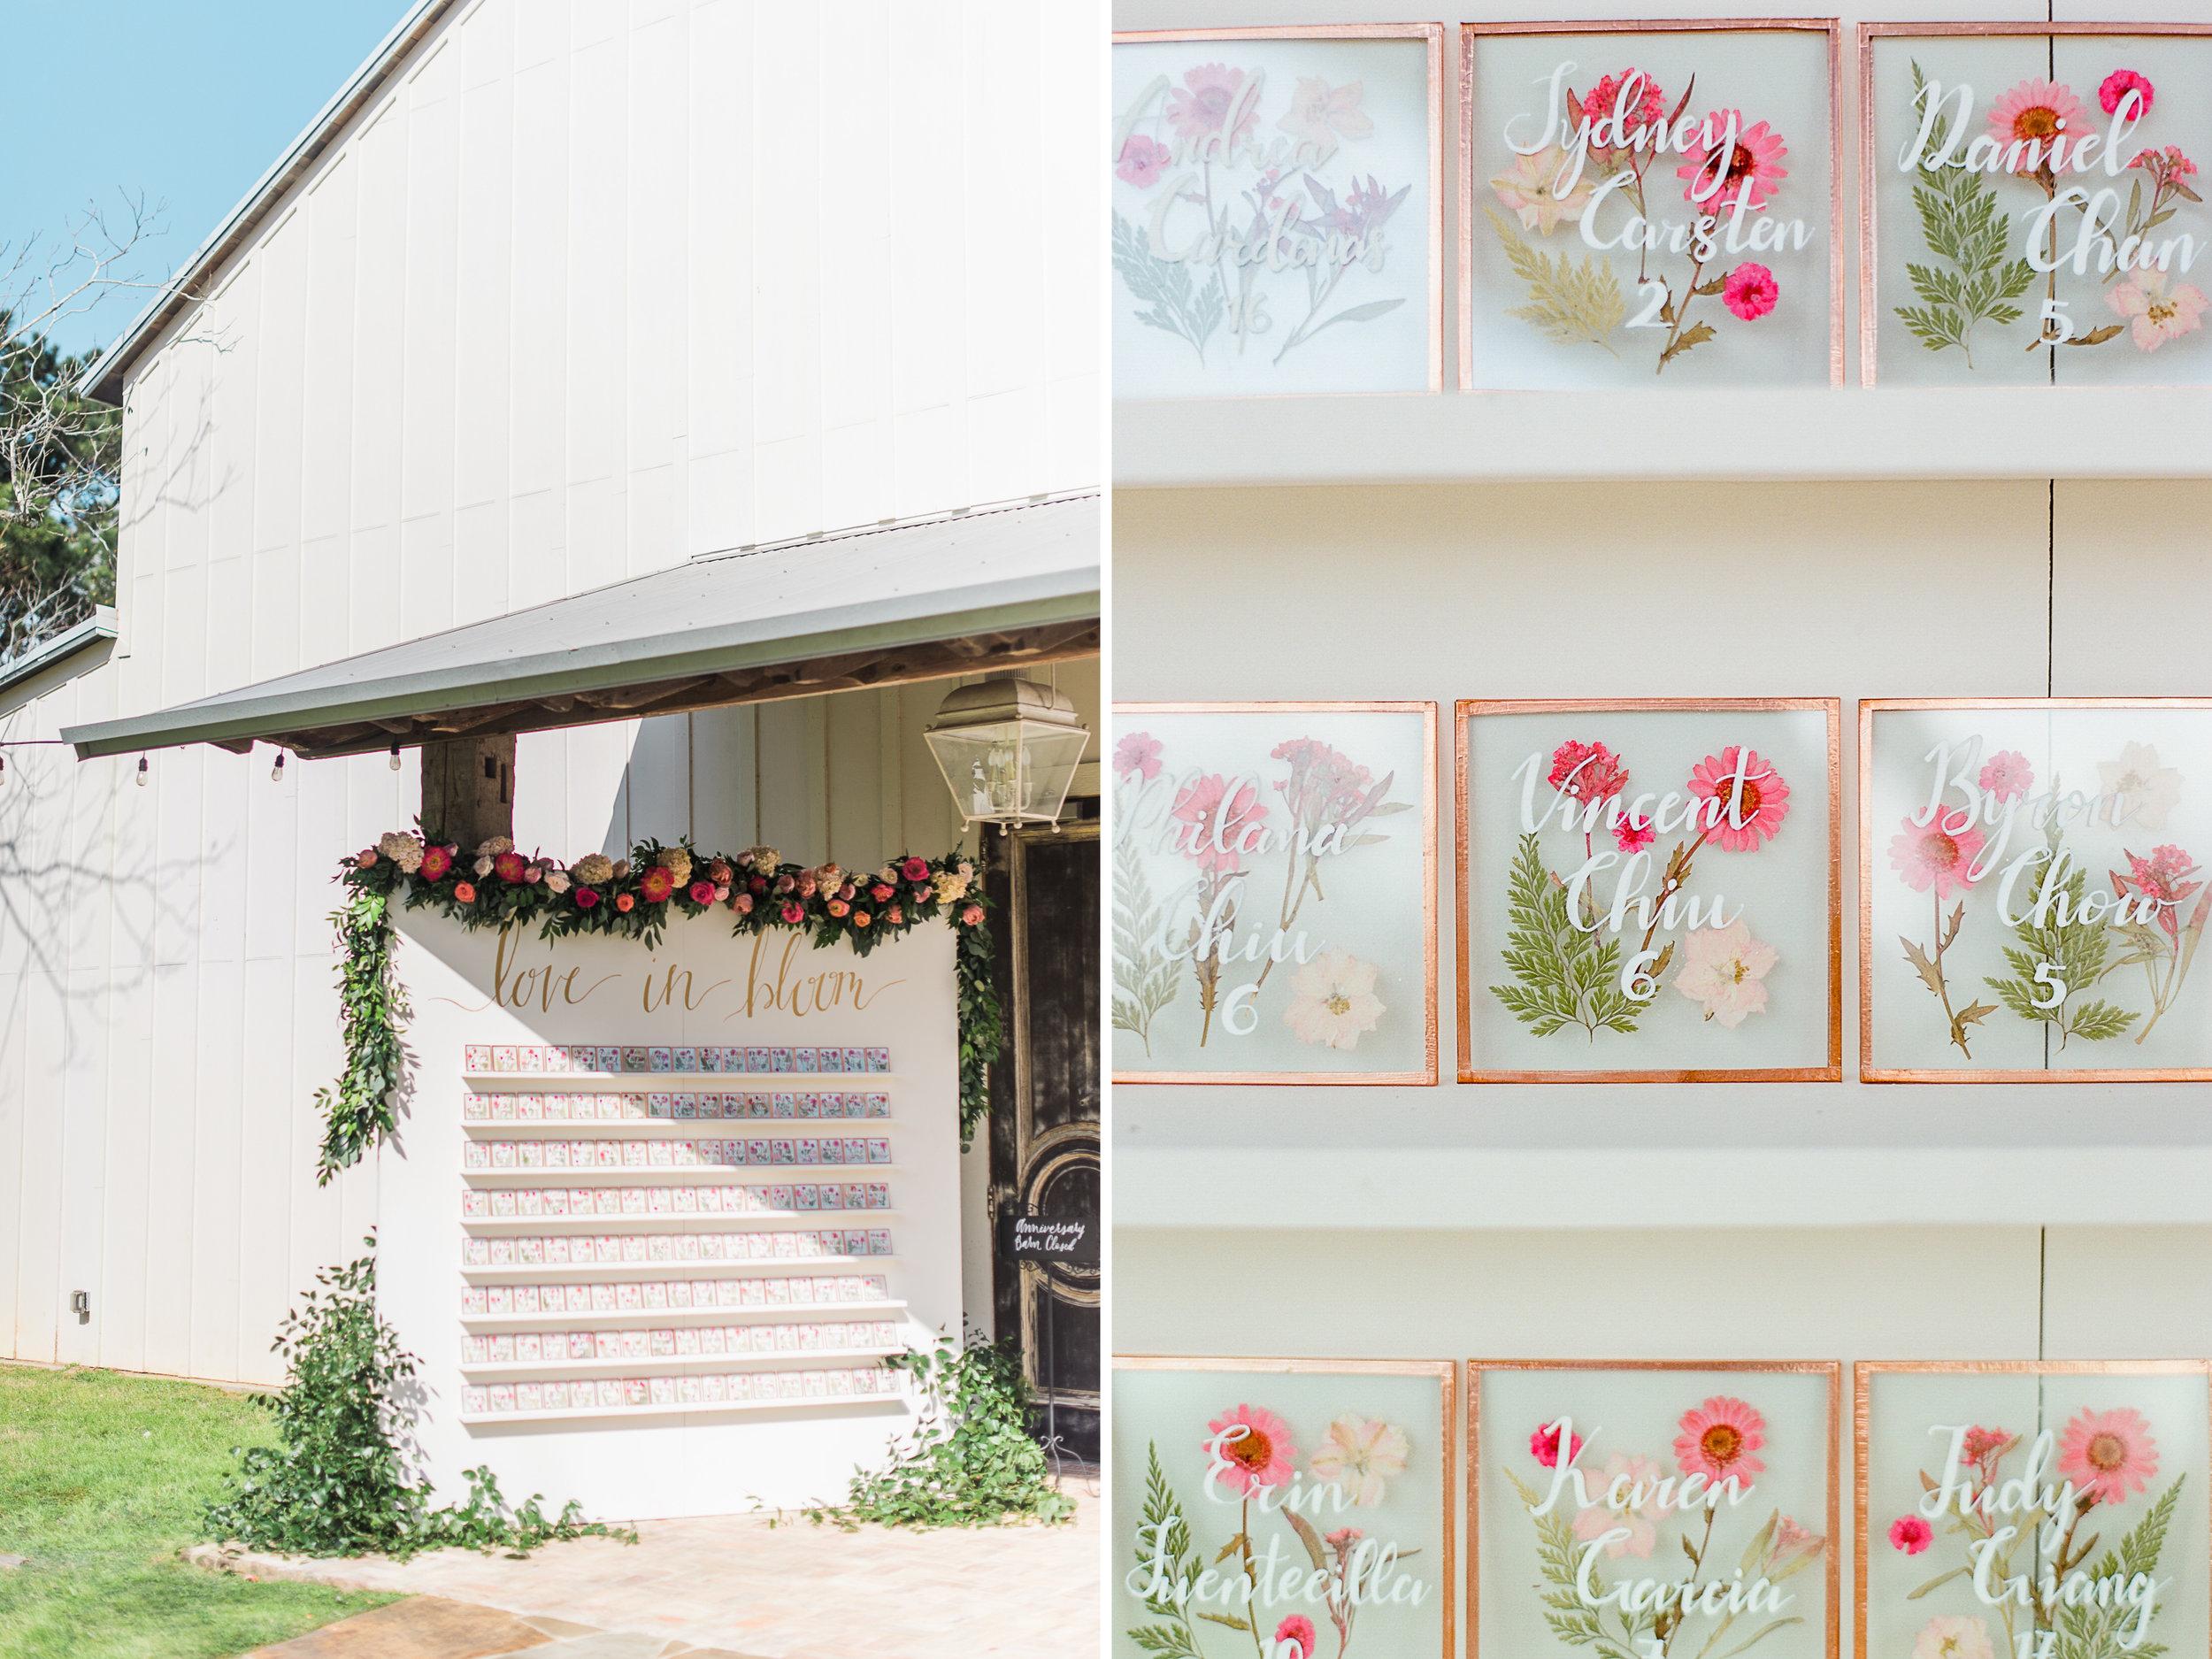 The-Knot-50-Weddings-50-States-Texas-Winner-Dana-Fernandez-photography-houston-wedding-photographer-film-fine-art-destination-161.jpg